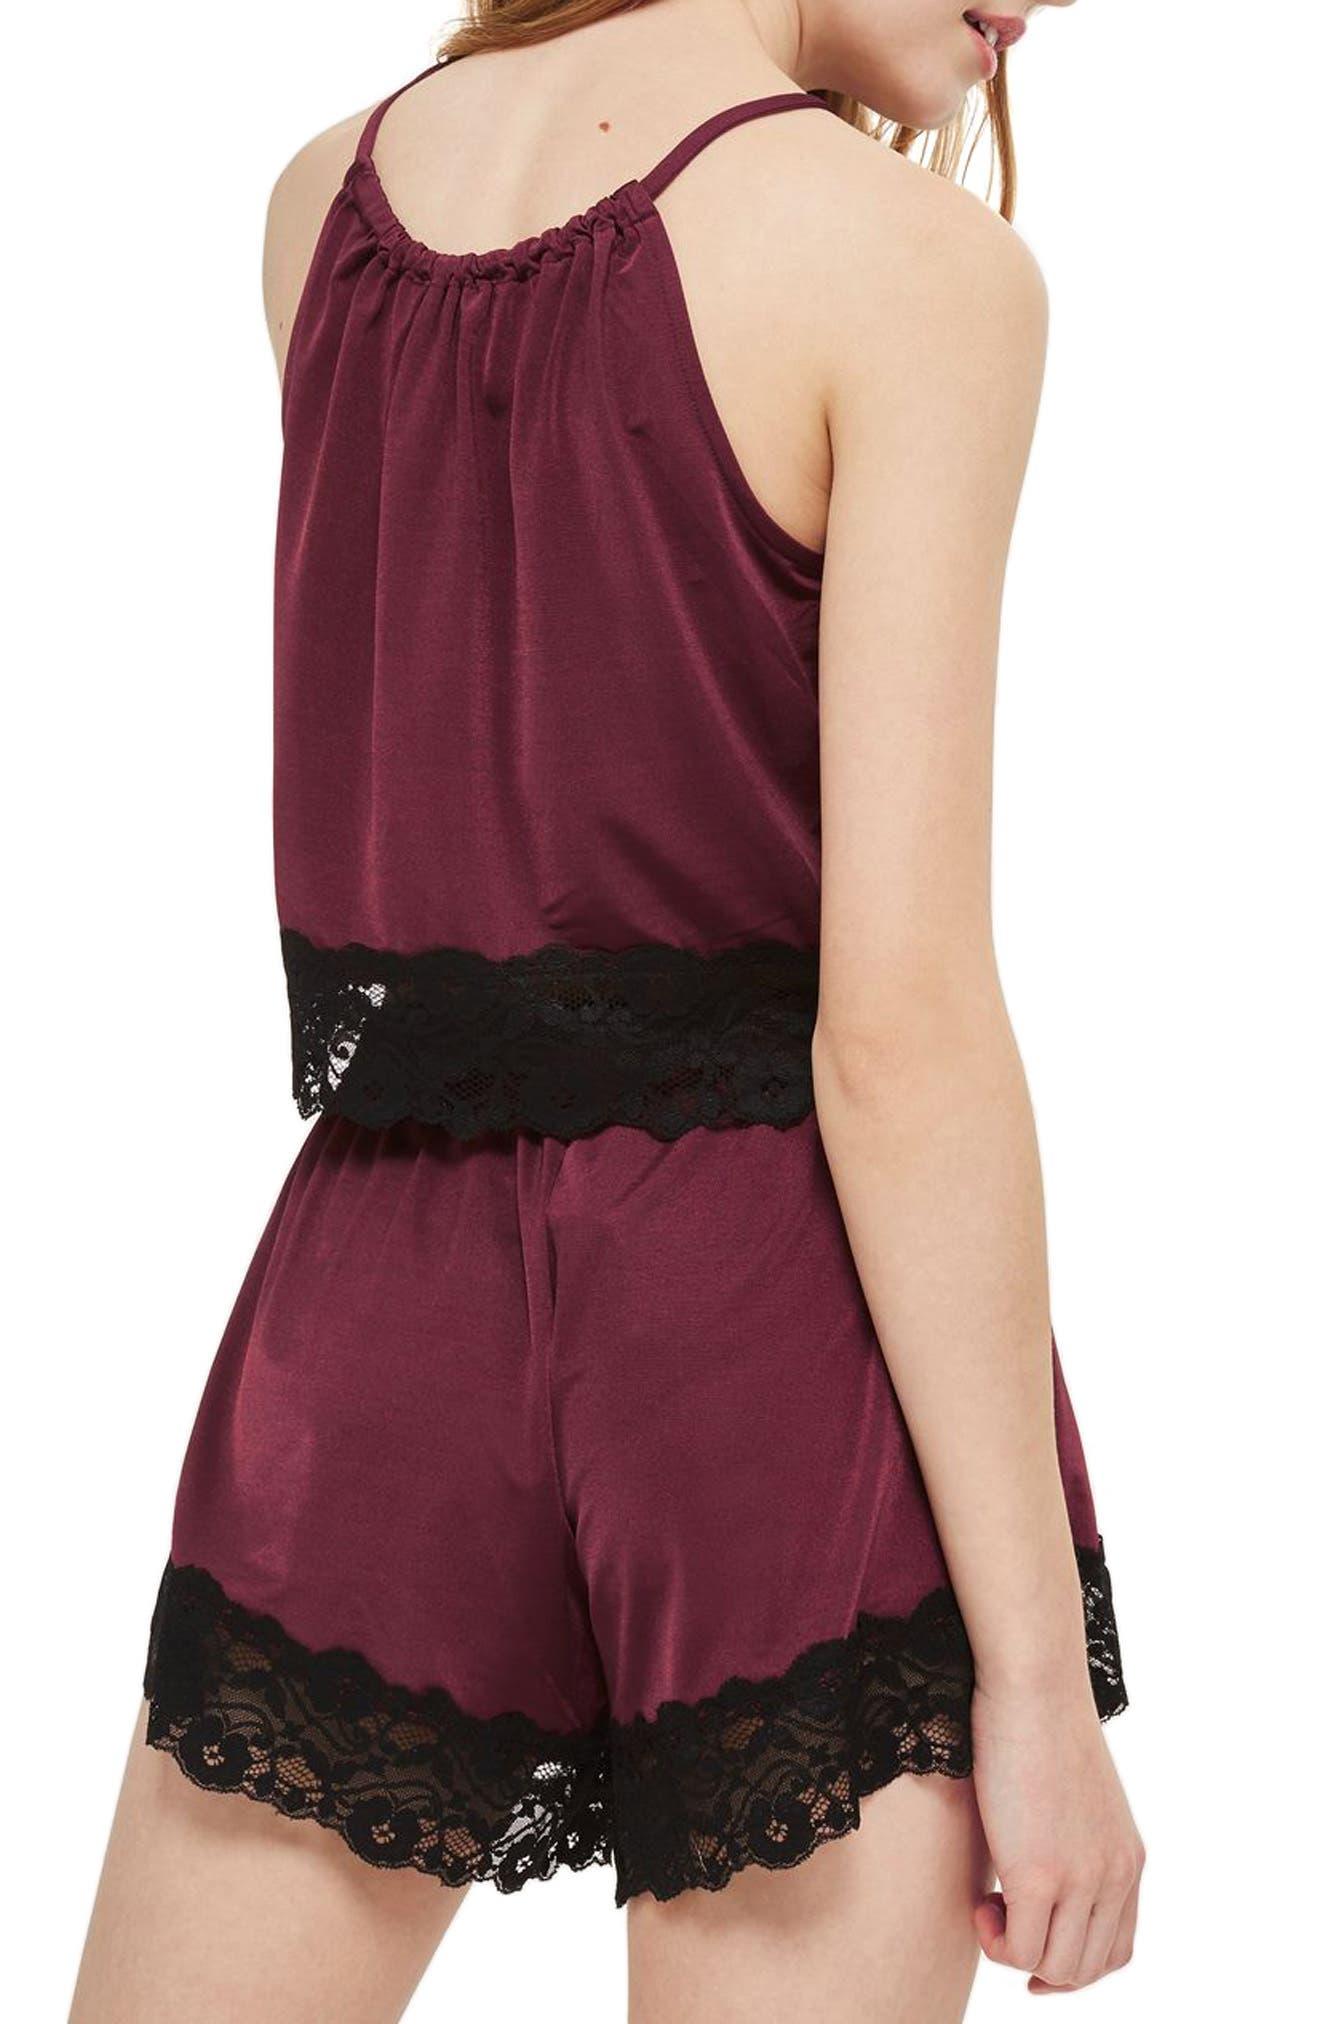 Jersey Satin & Lace Short Pajama Shorts,                             Alternate thumbnail 3, color,                             Berry Multi